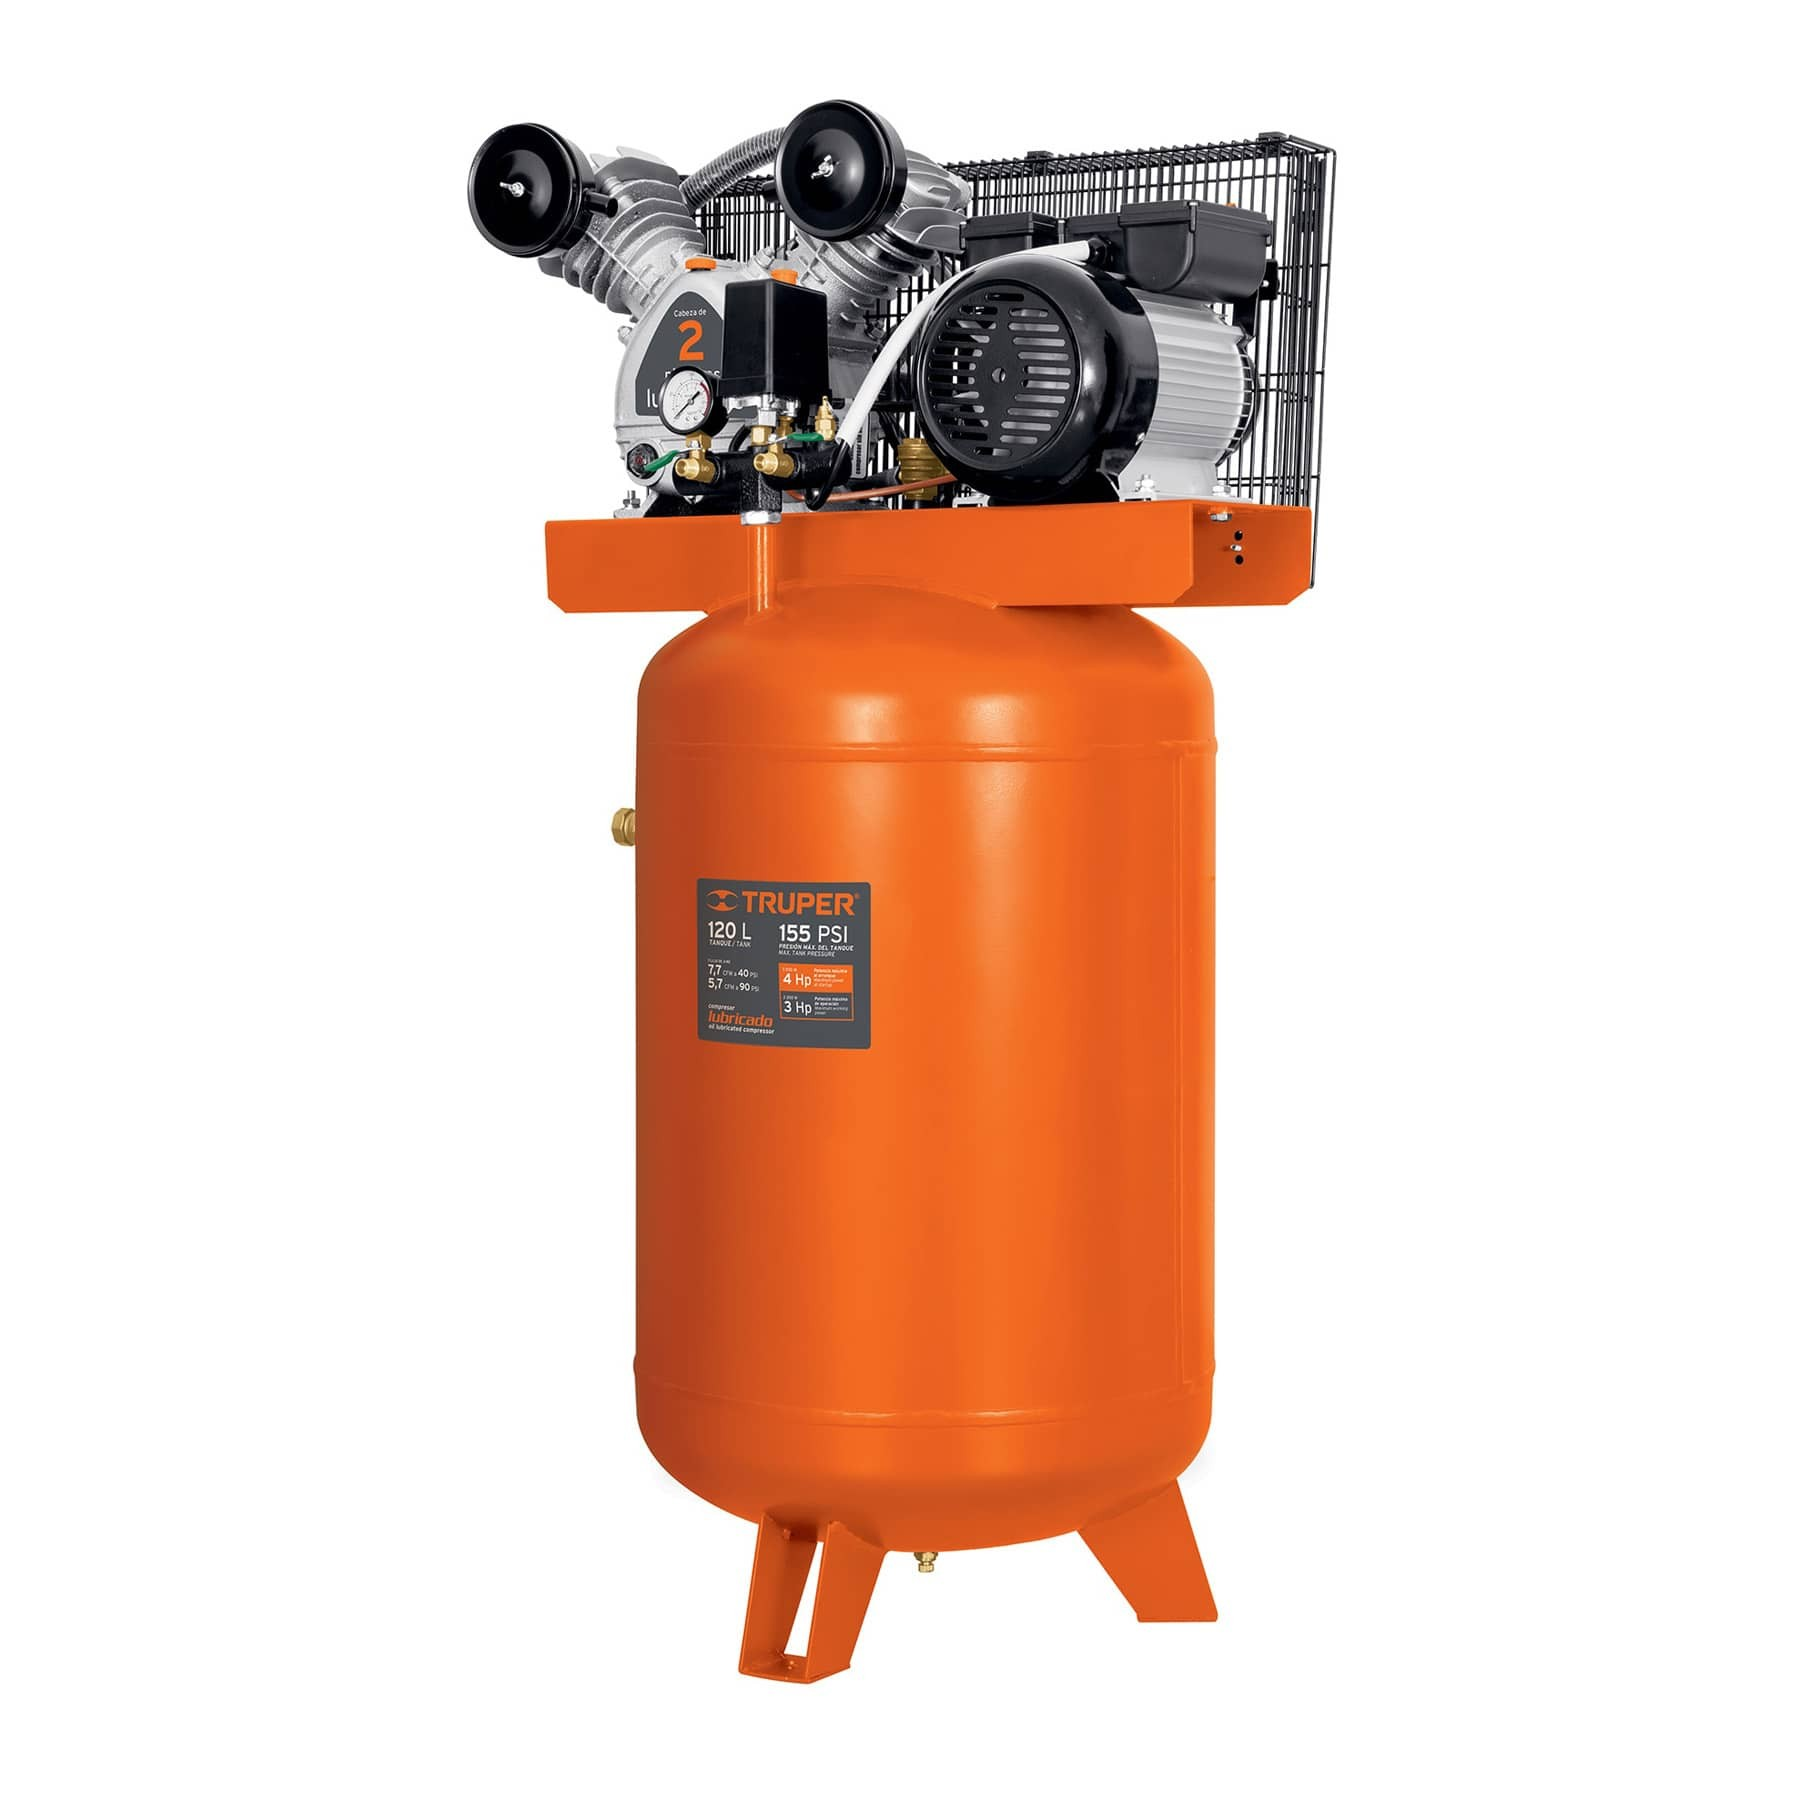 Compresor vertical 120 L, 4 HP (potencia máxima ), 220 V